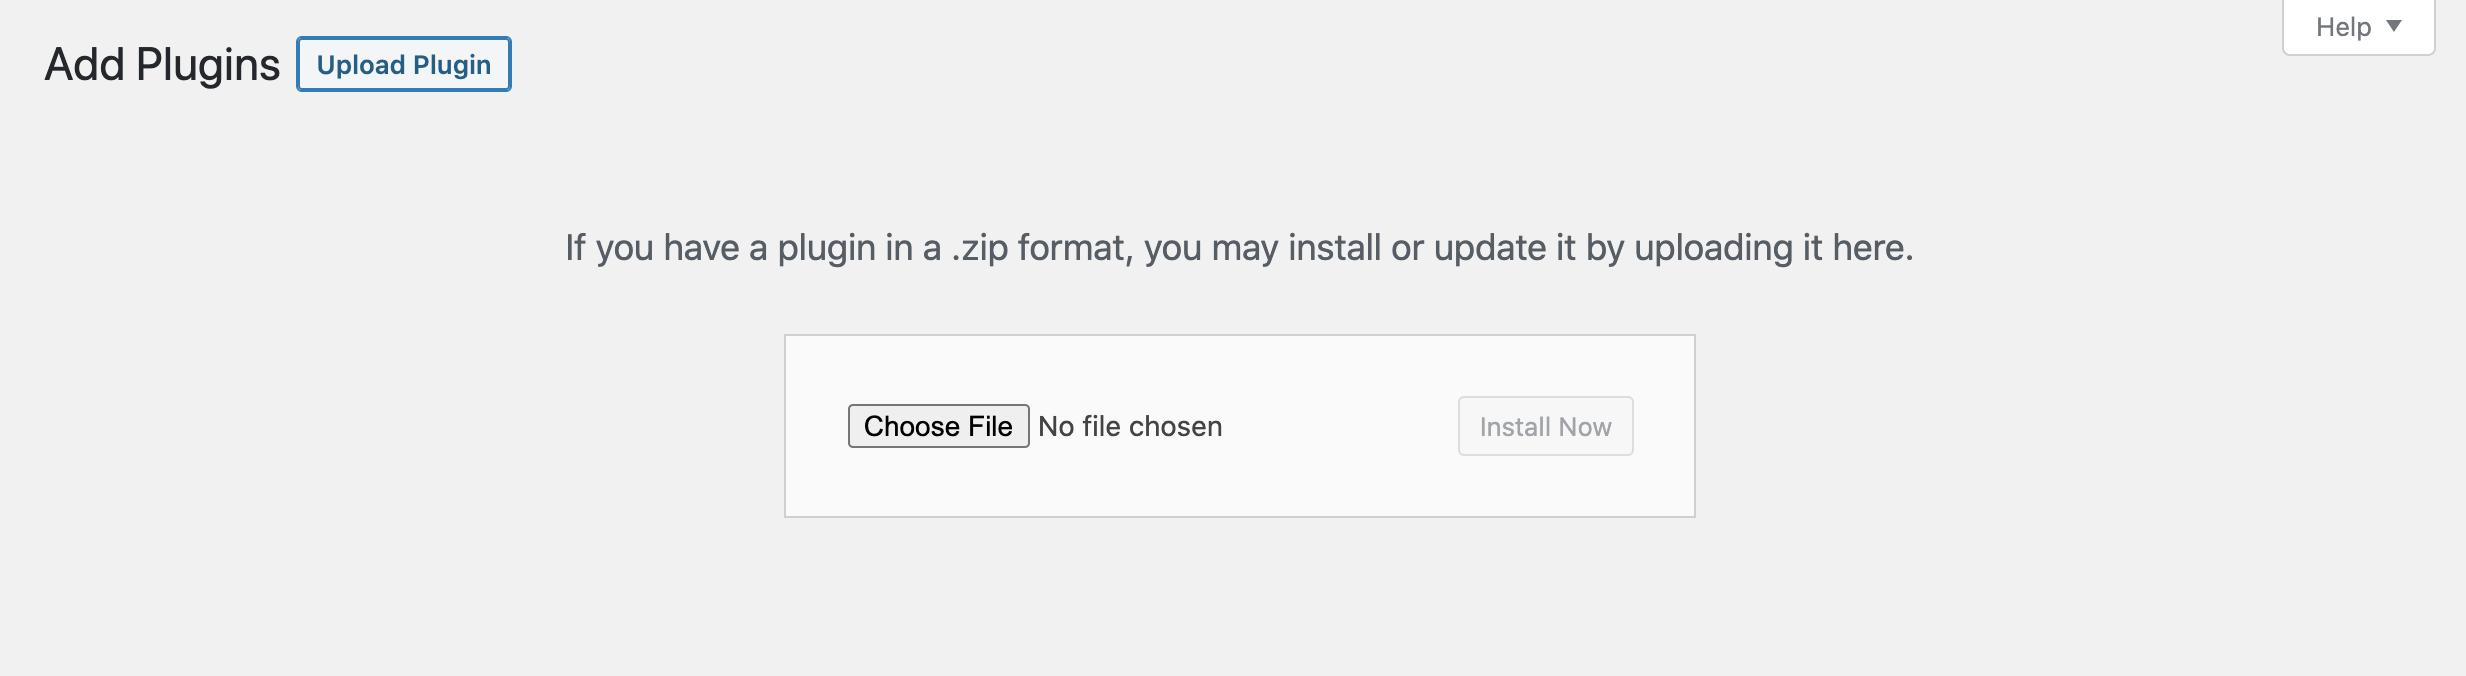 Manually add a new plugin